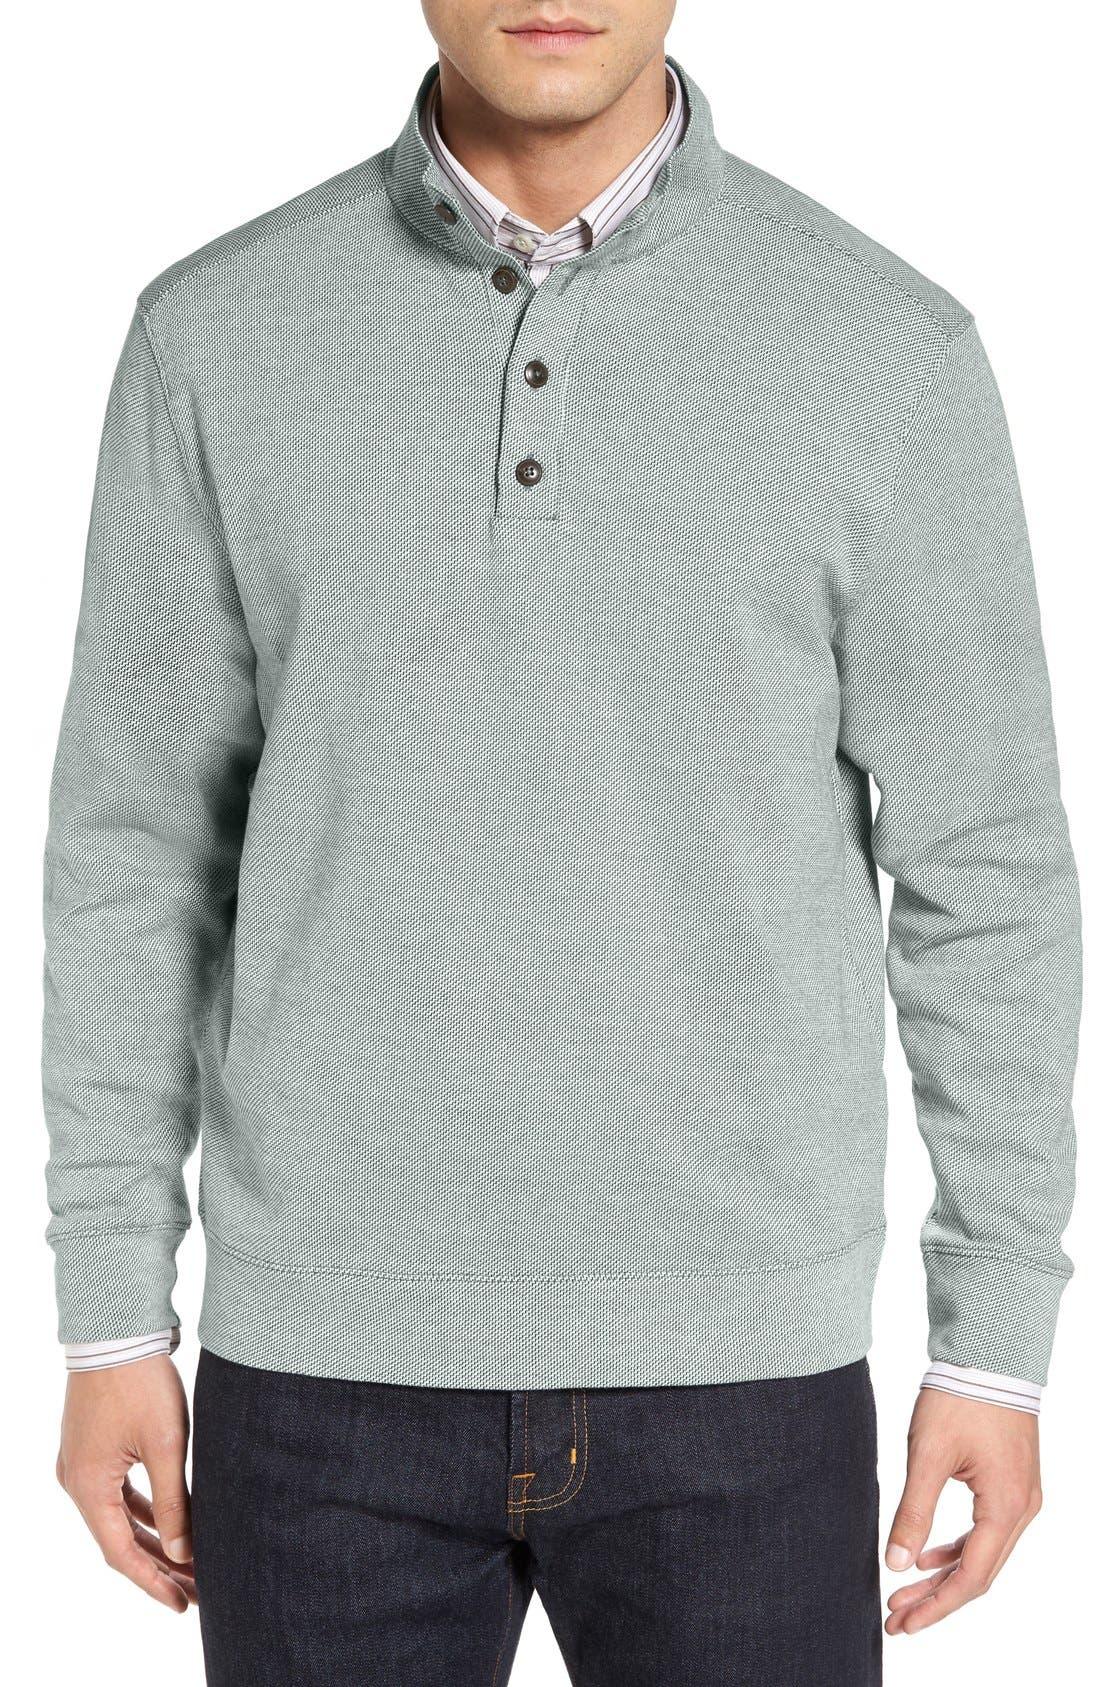 'Quinalt' Mock Neck Pullover,                             Main thumbnail 1, color,                             355